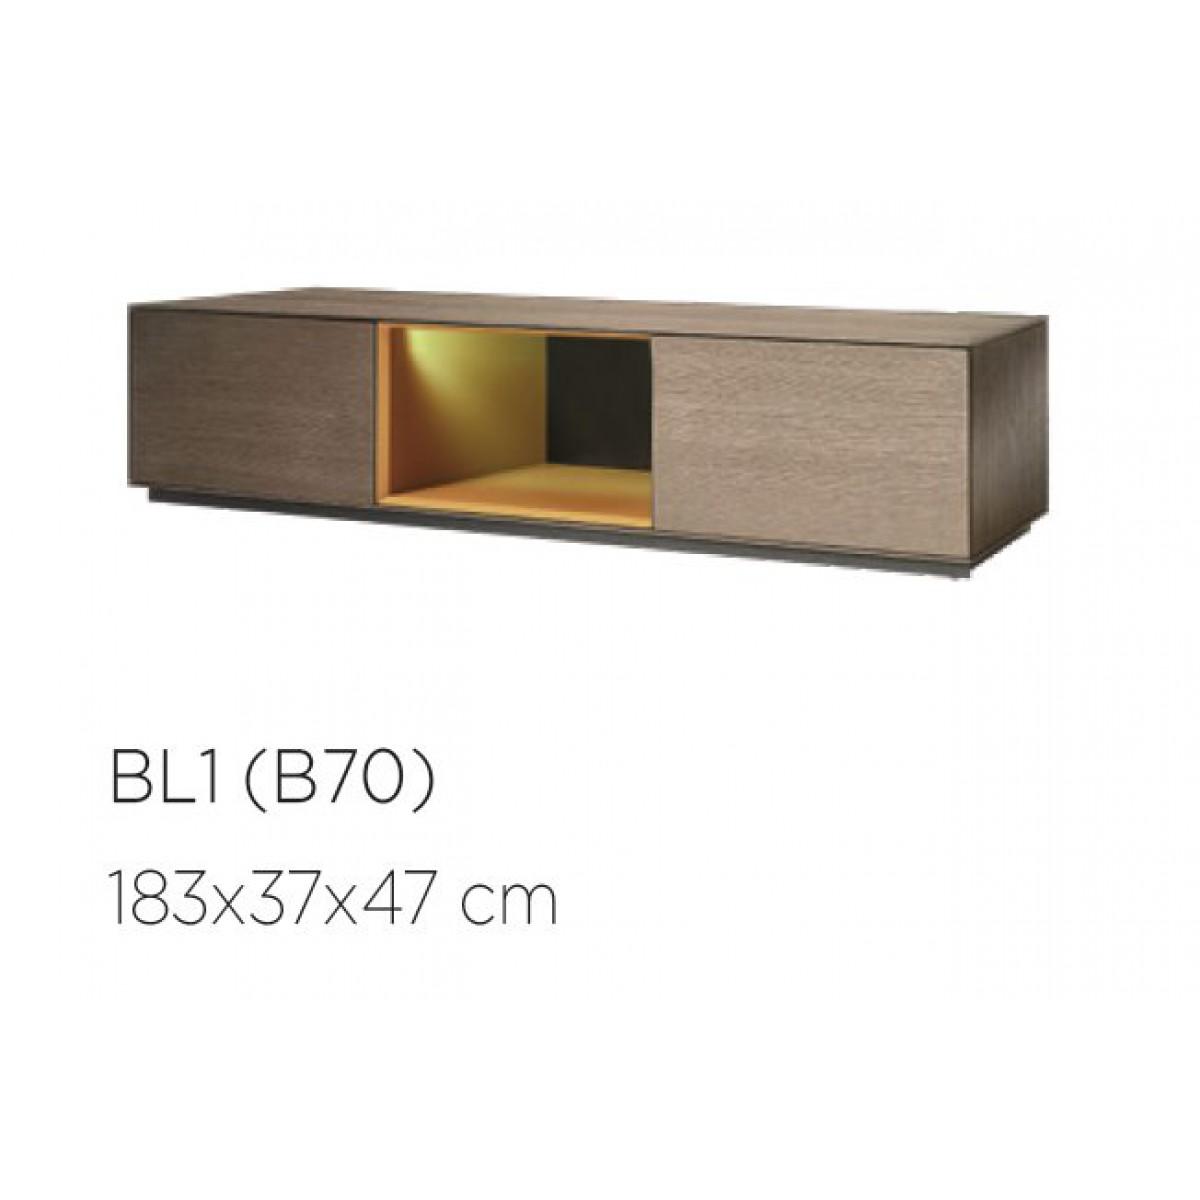 tv-meubel-sokkel-dressoir-bloom-eiken-BL1-miltonhouse-plint-hangend